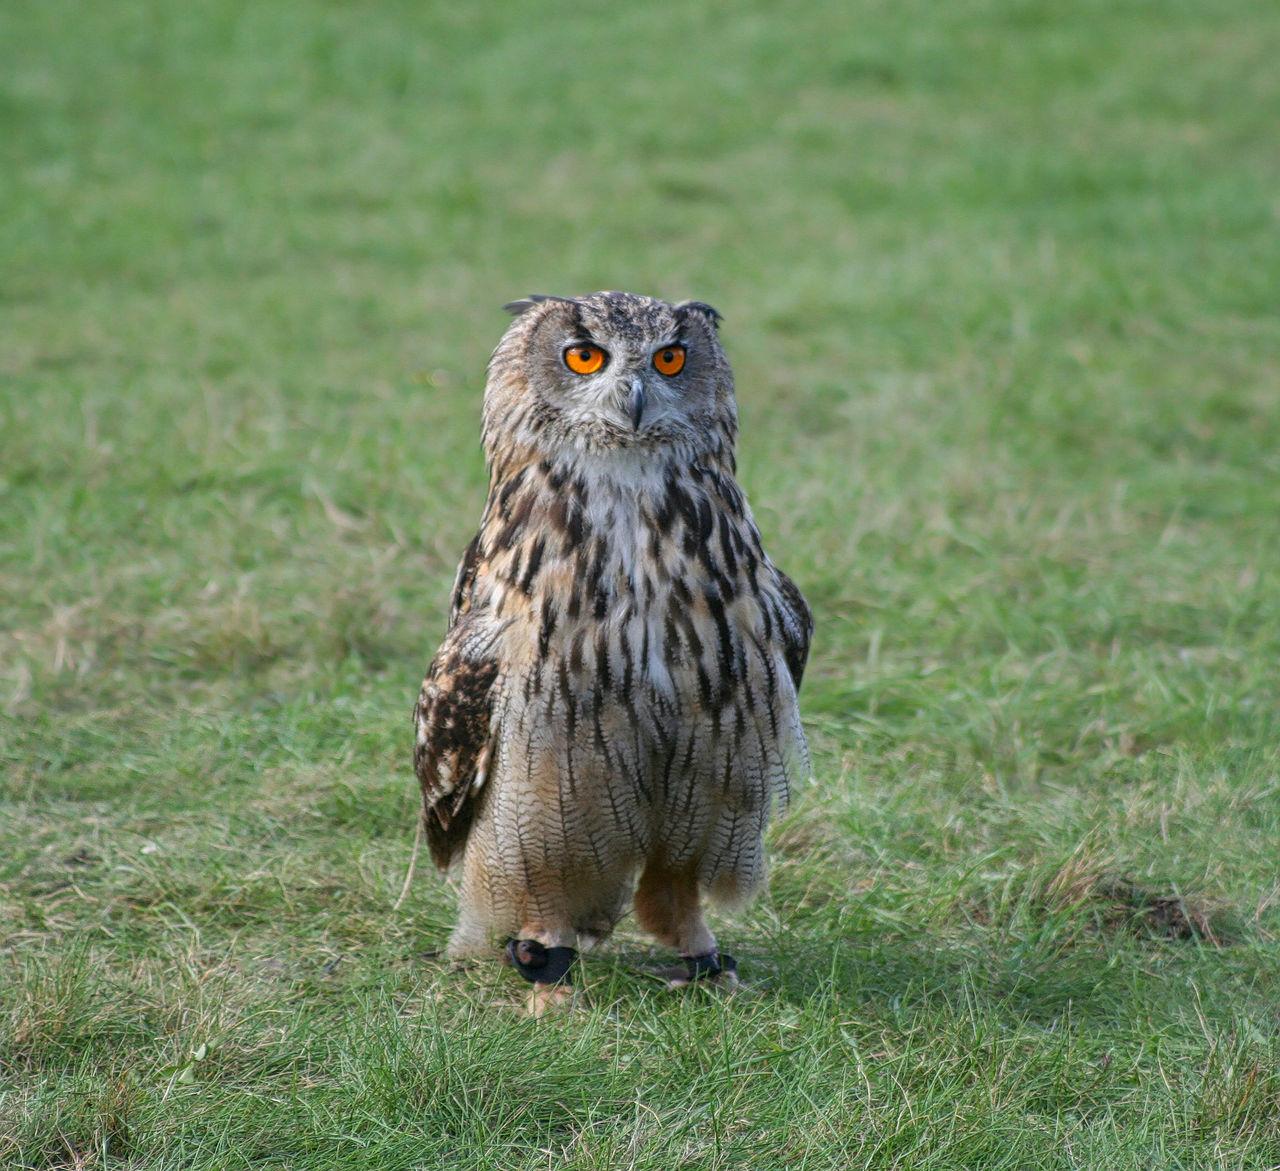 Portrait Of Eagle Owl Perching On Grassy Field